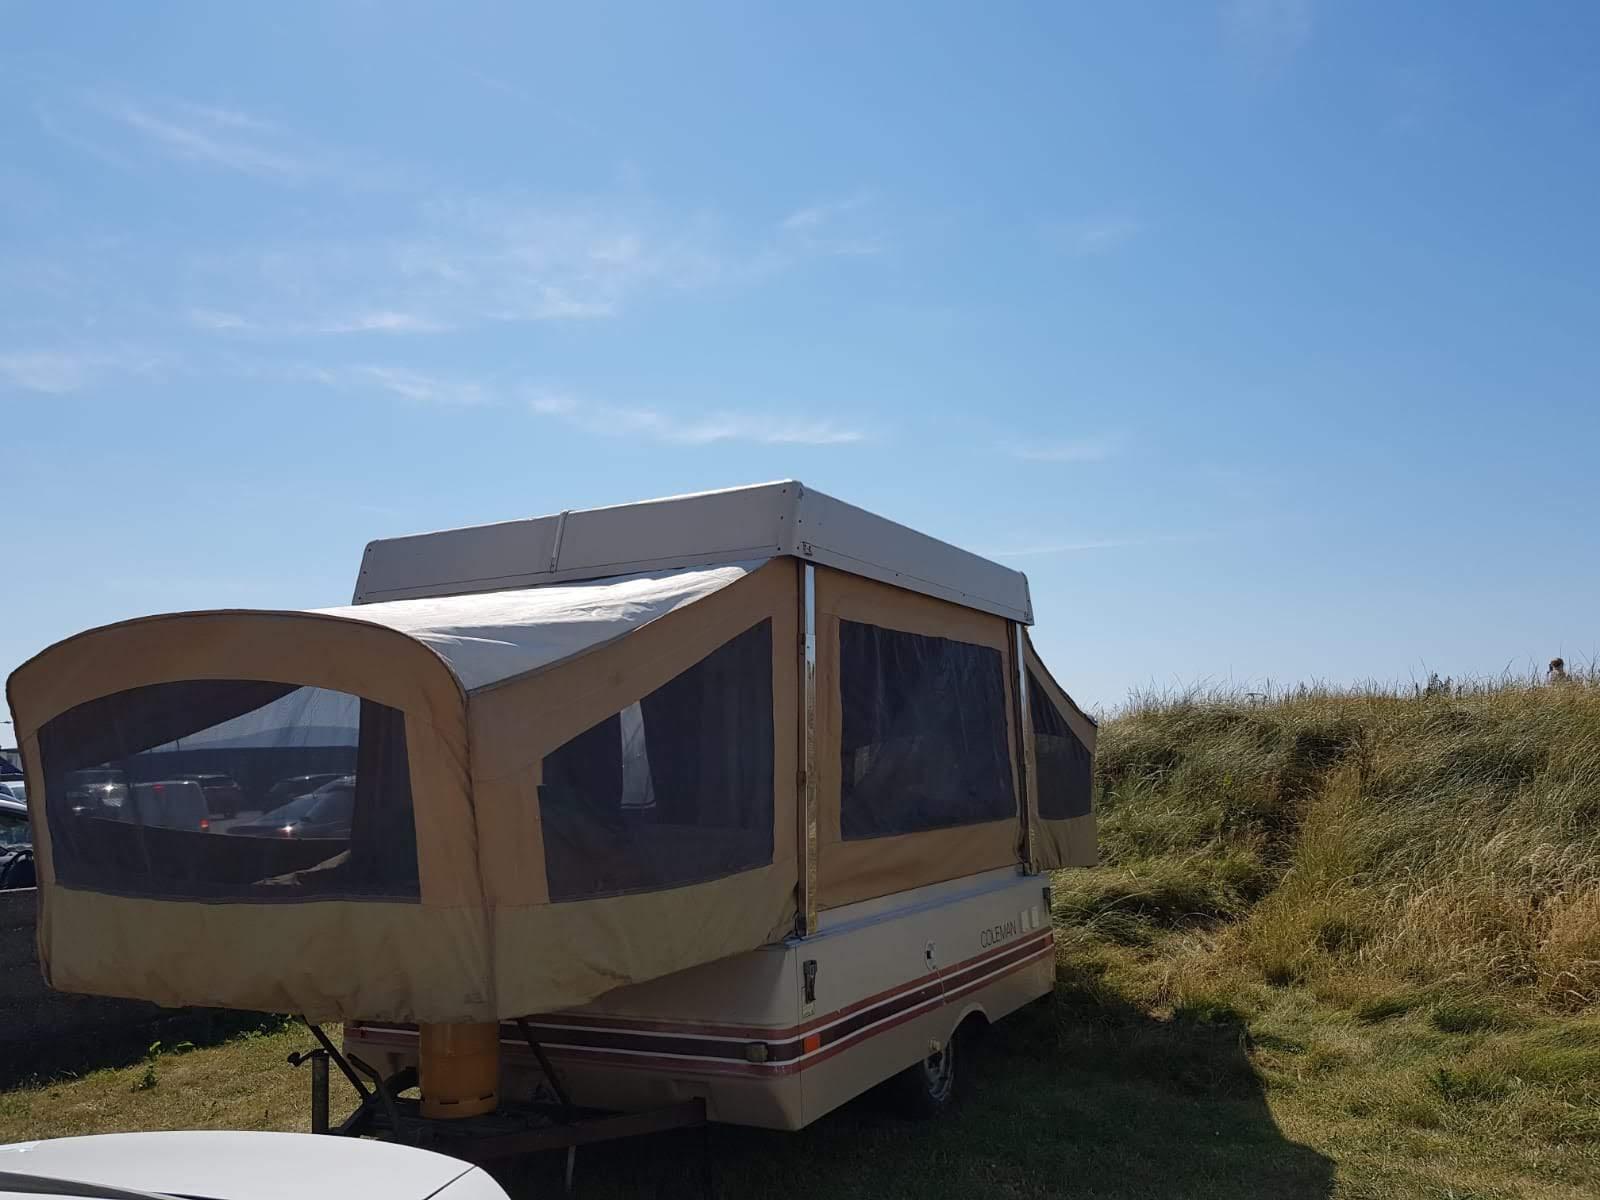 Strandhill Caravan & Camping Rates - Sligo Caravan